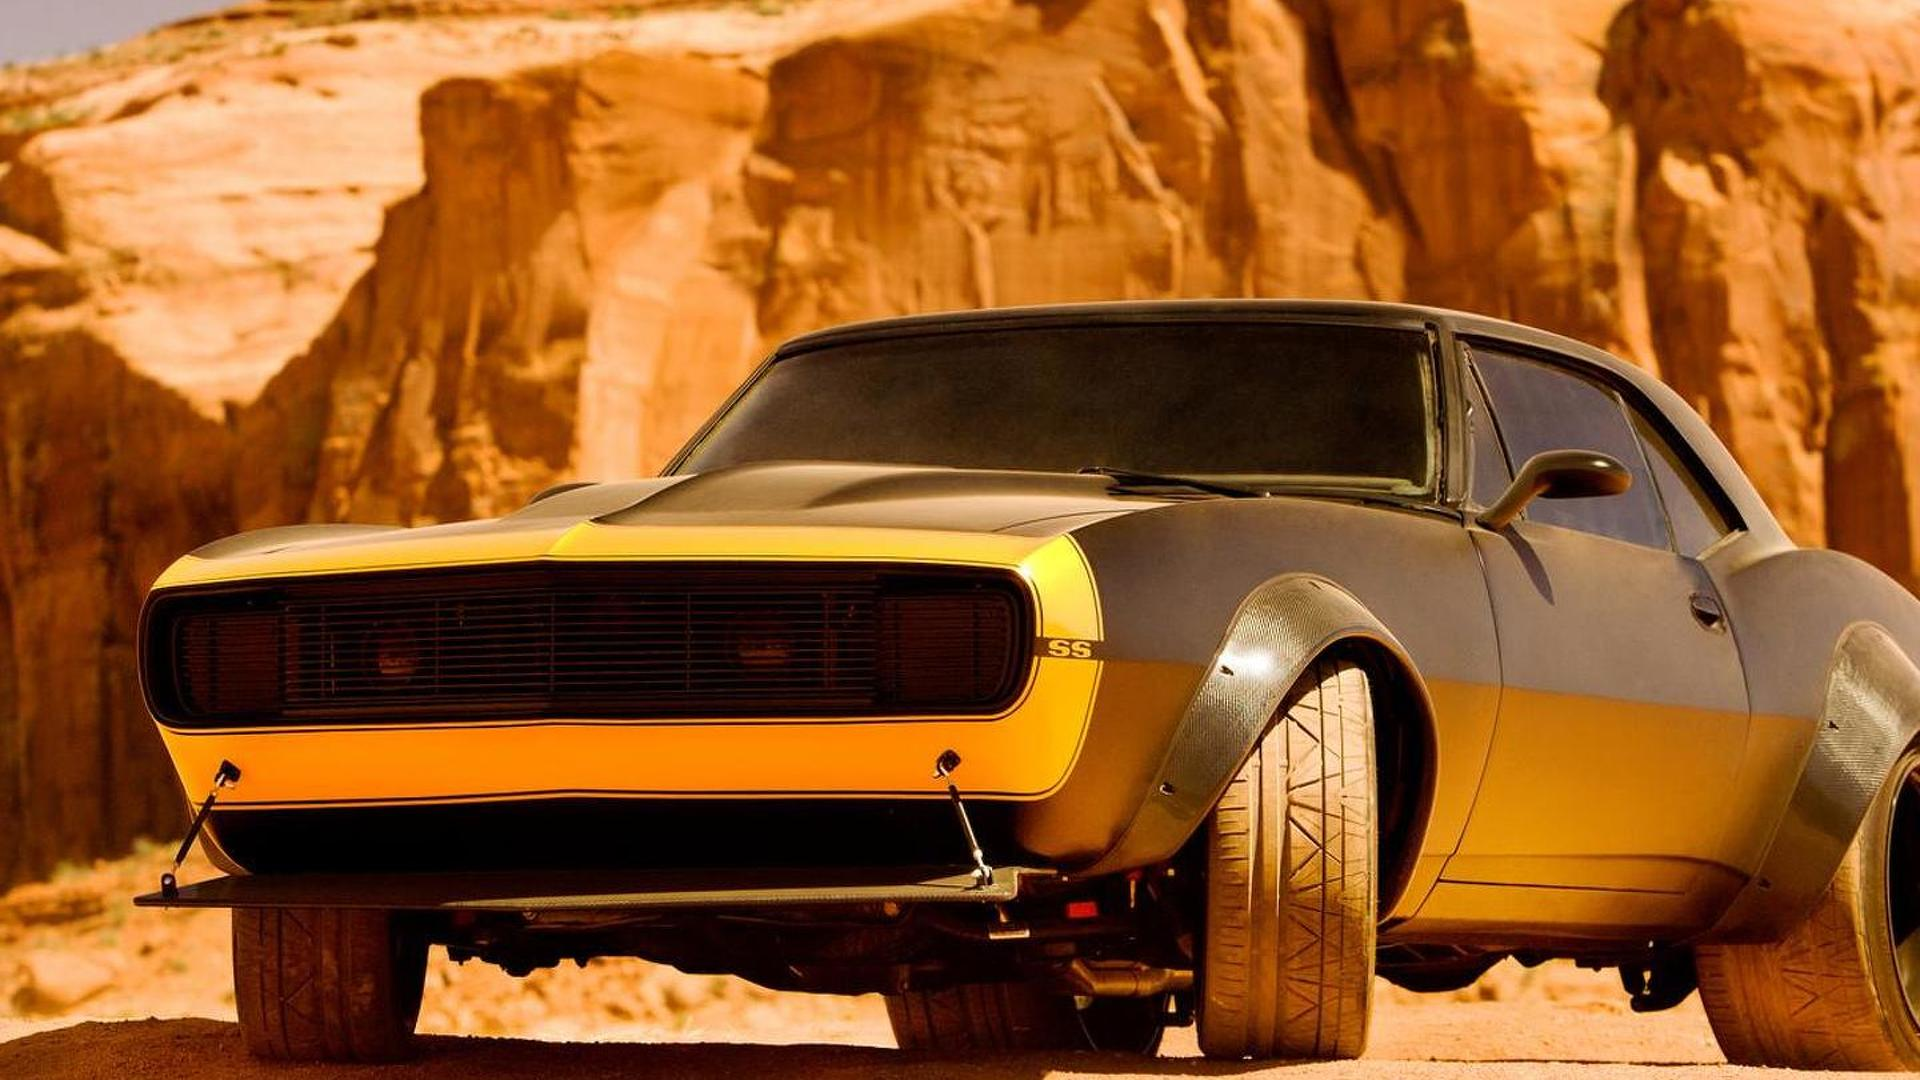 Kelebihan Kekurangan Chevrolet Camaro Transformers Top Model Tahun Ini